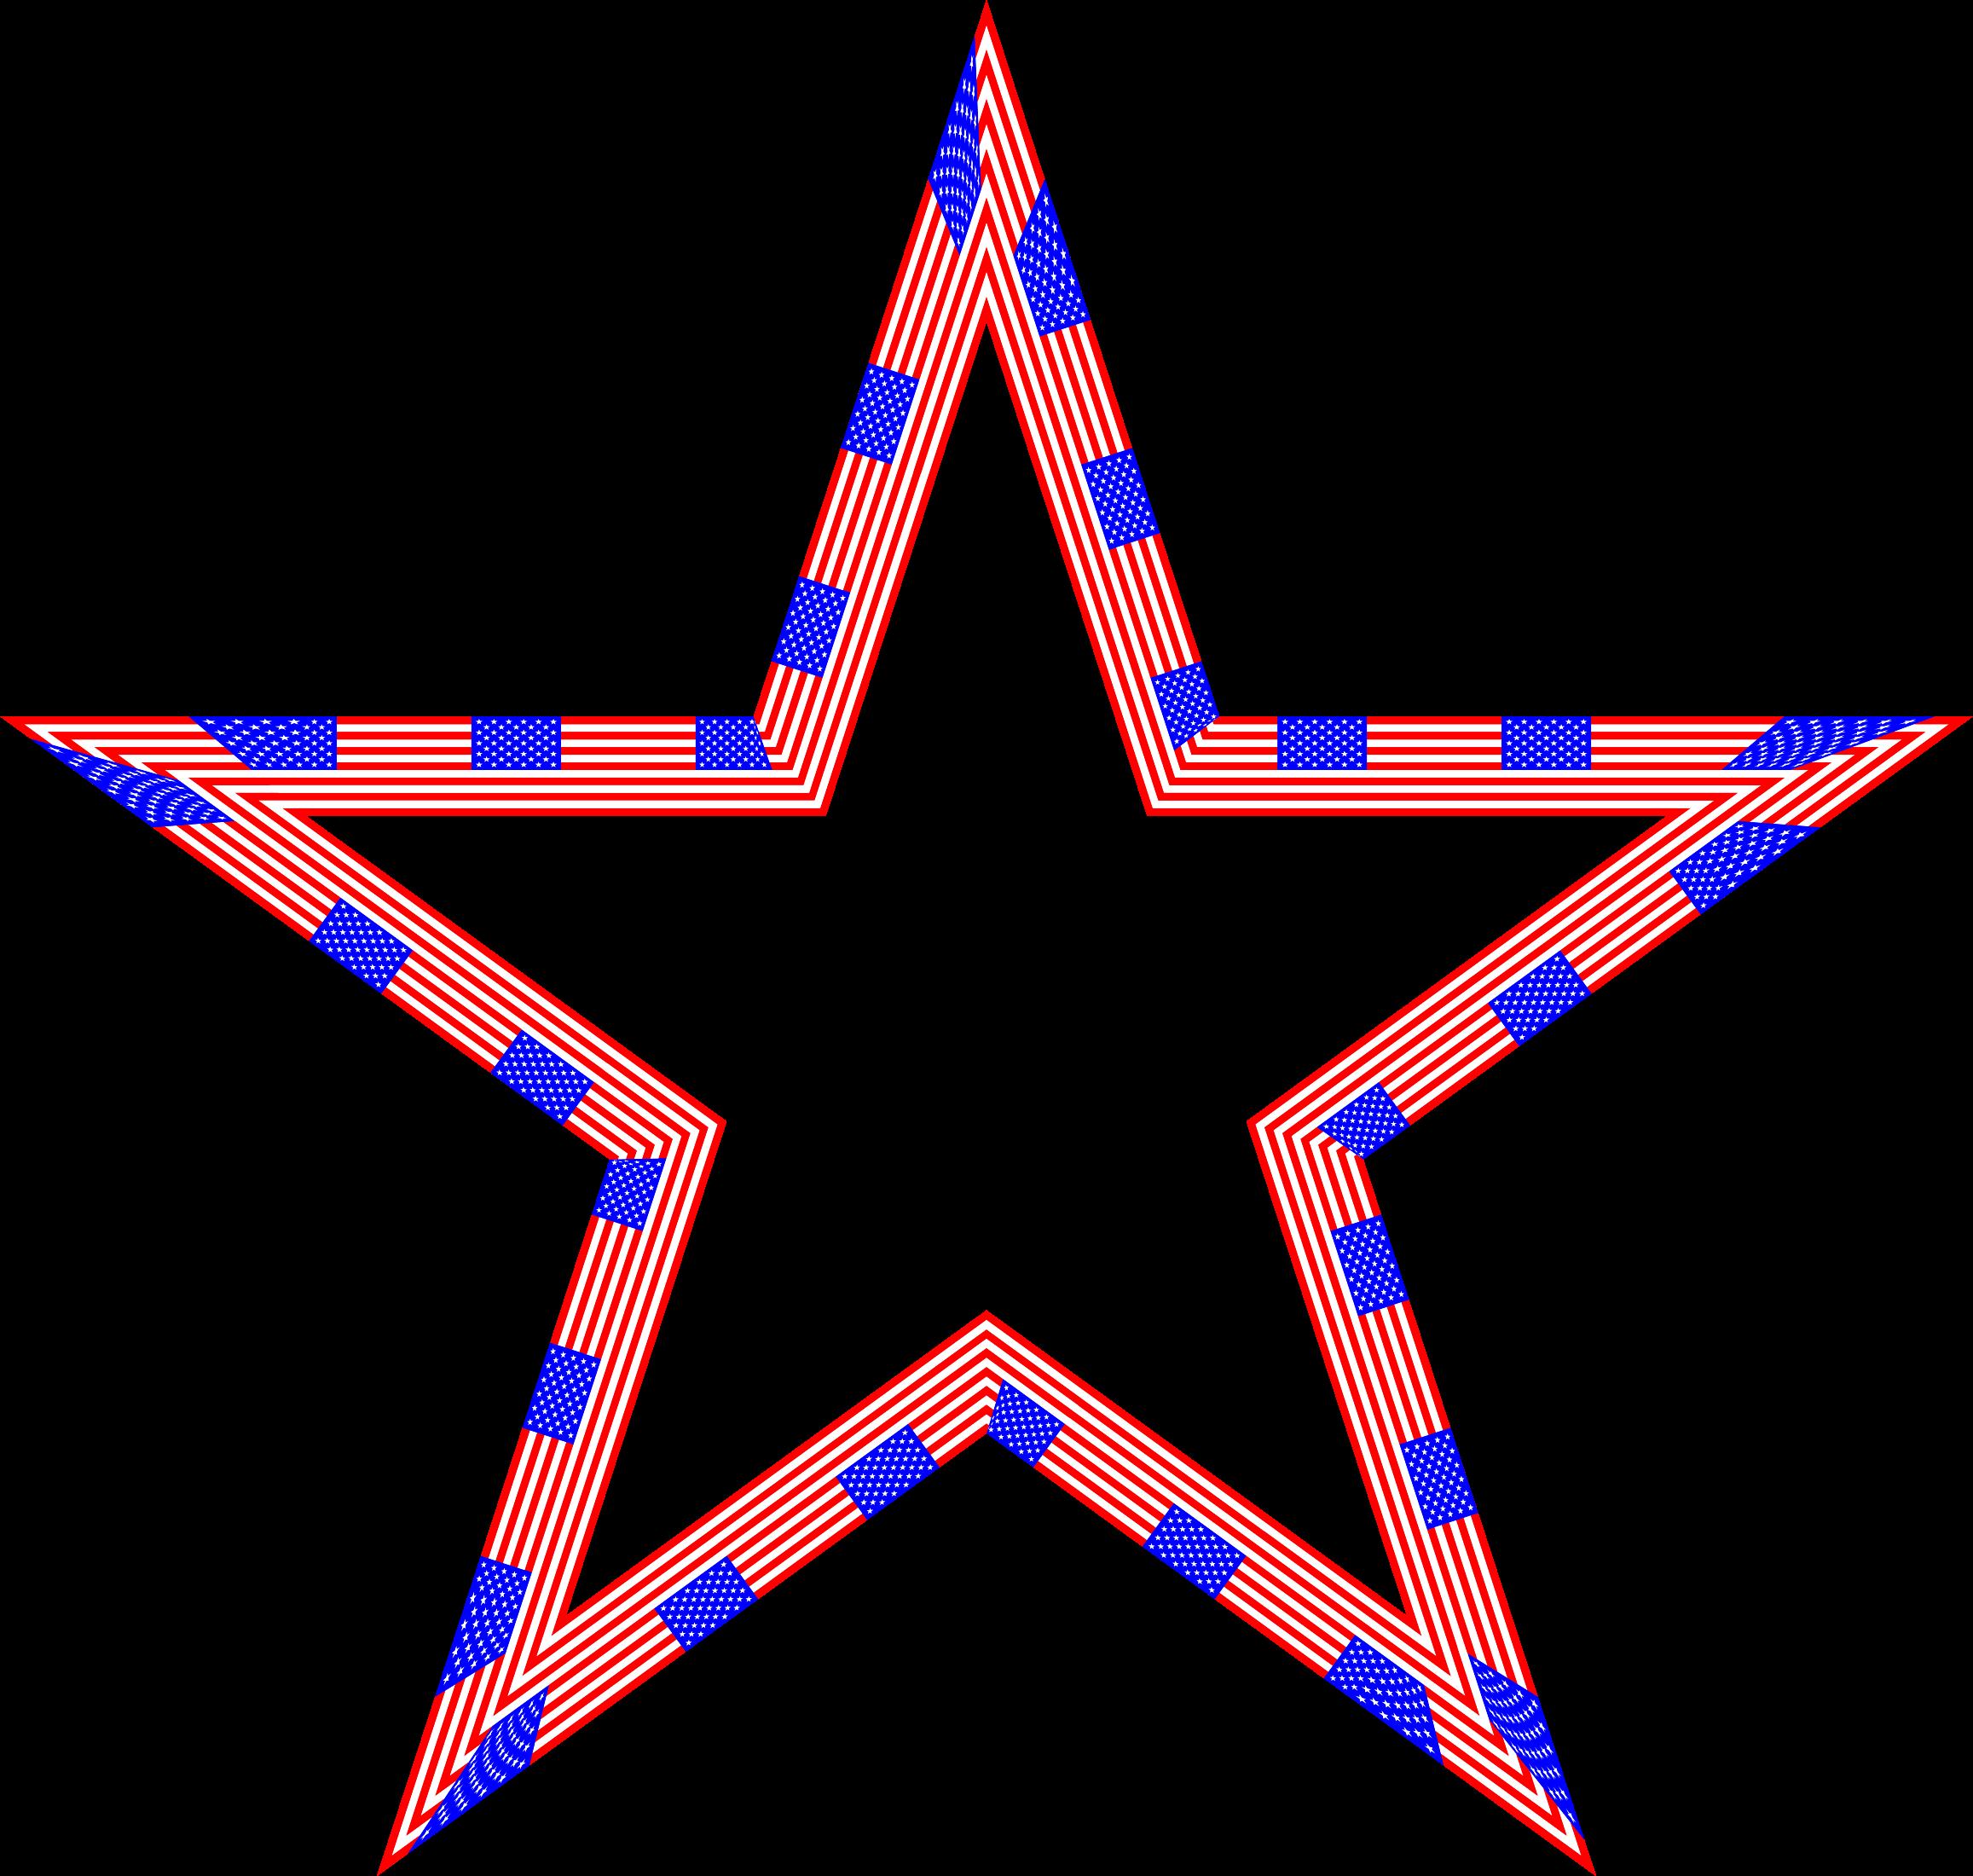 Patriotic clipart star usa, Patriotic star usa Transparent ...